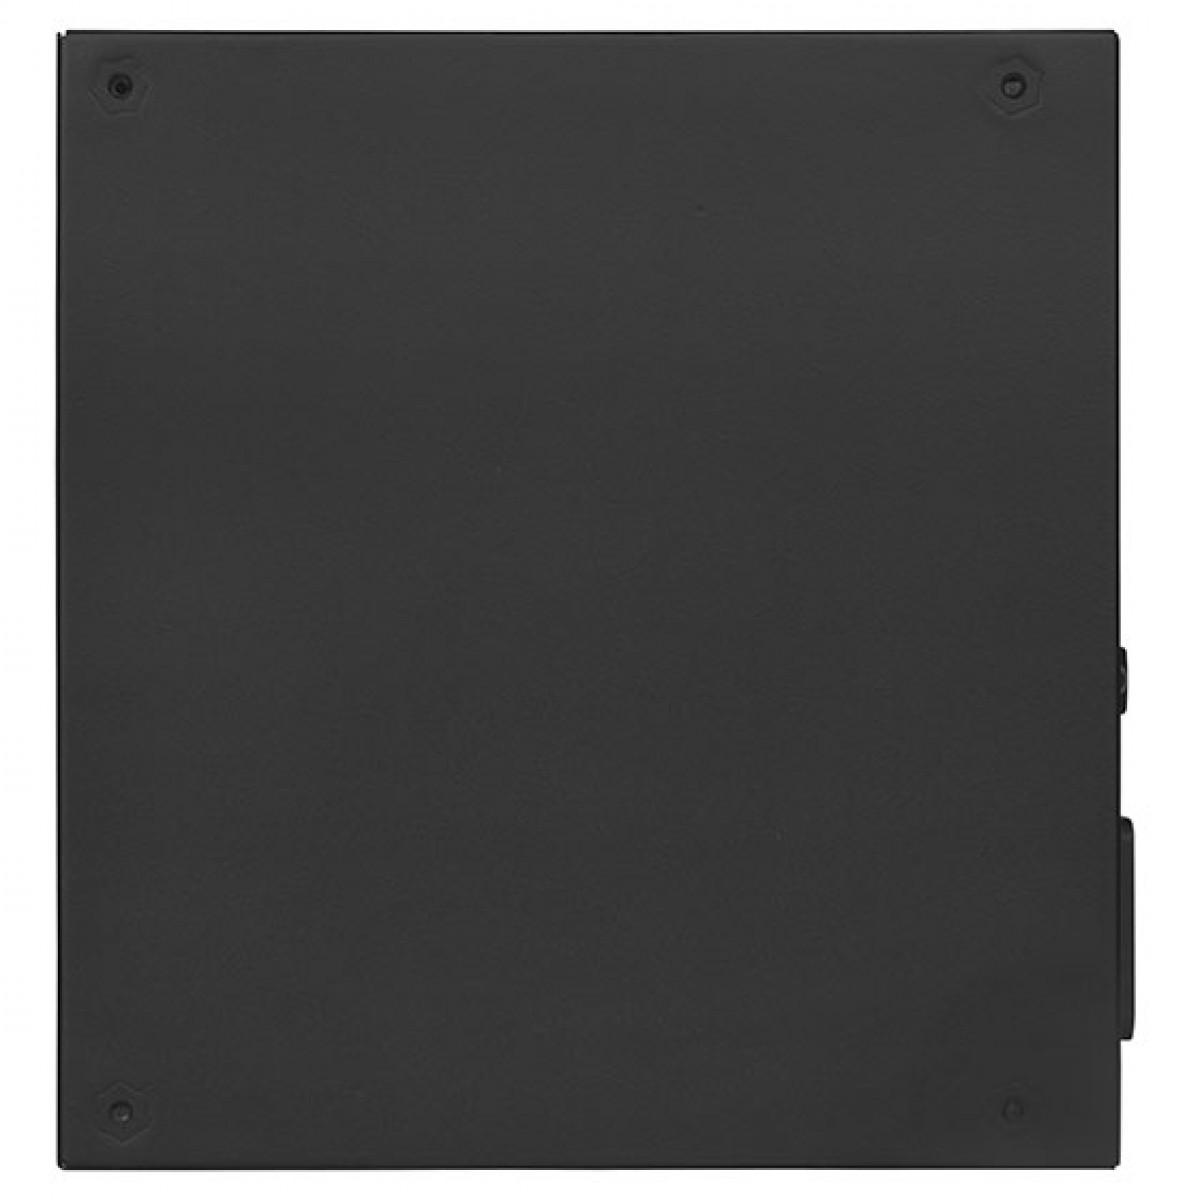 Fonte SilverStone SST-ET650-G, 650W, 80 Plus Gold, PFC Ativo, SST-ET650-G